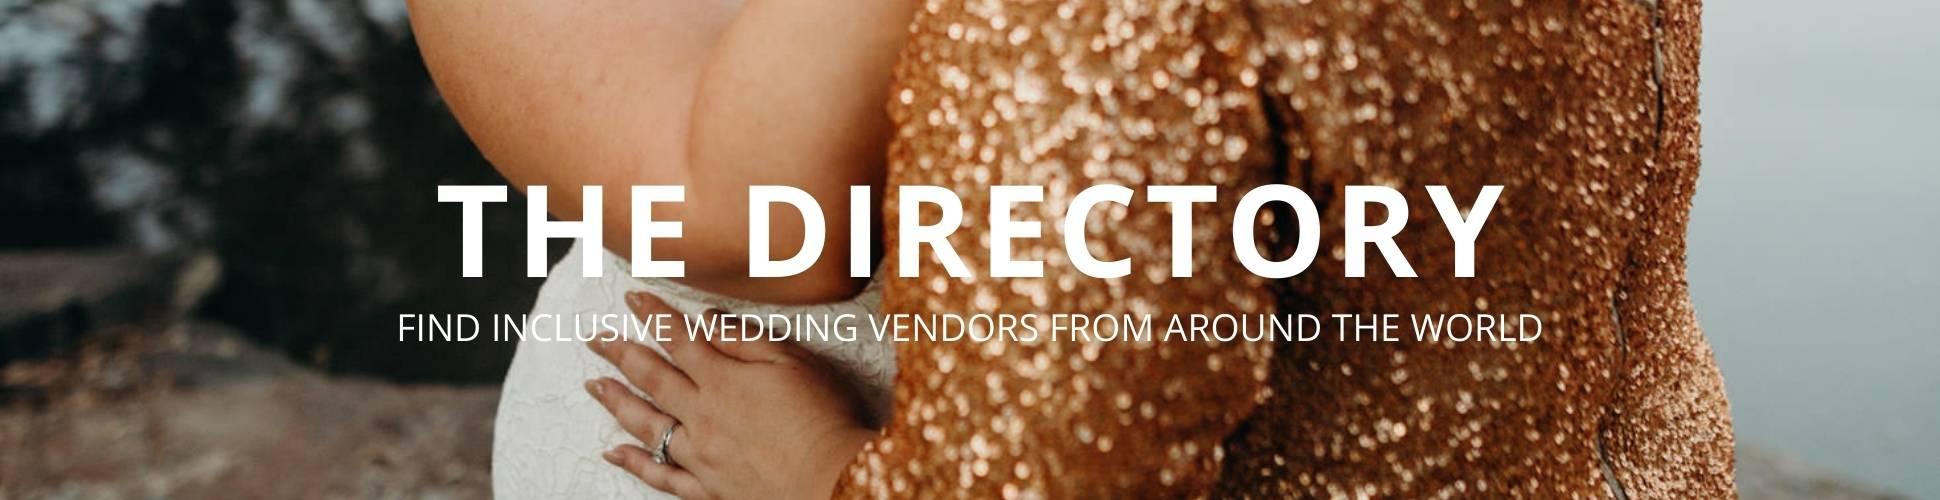 Same-Sex-Wedding-Magazine-Dancing-With-Her-Lesbian-Wedding-directory